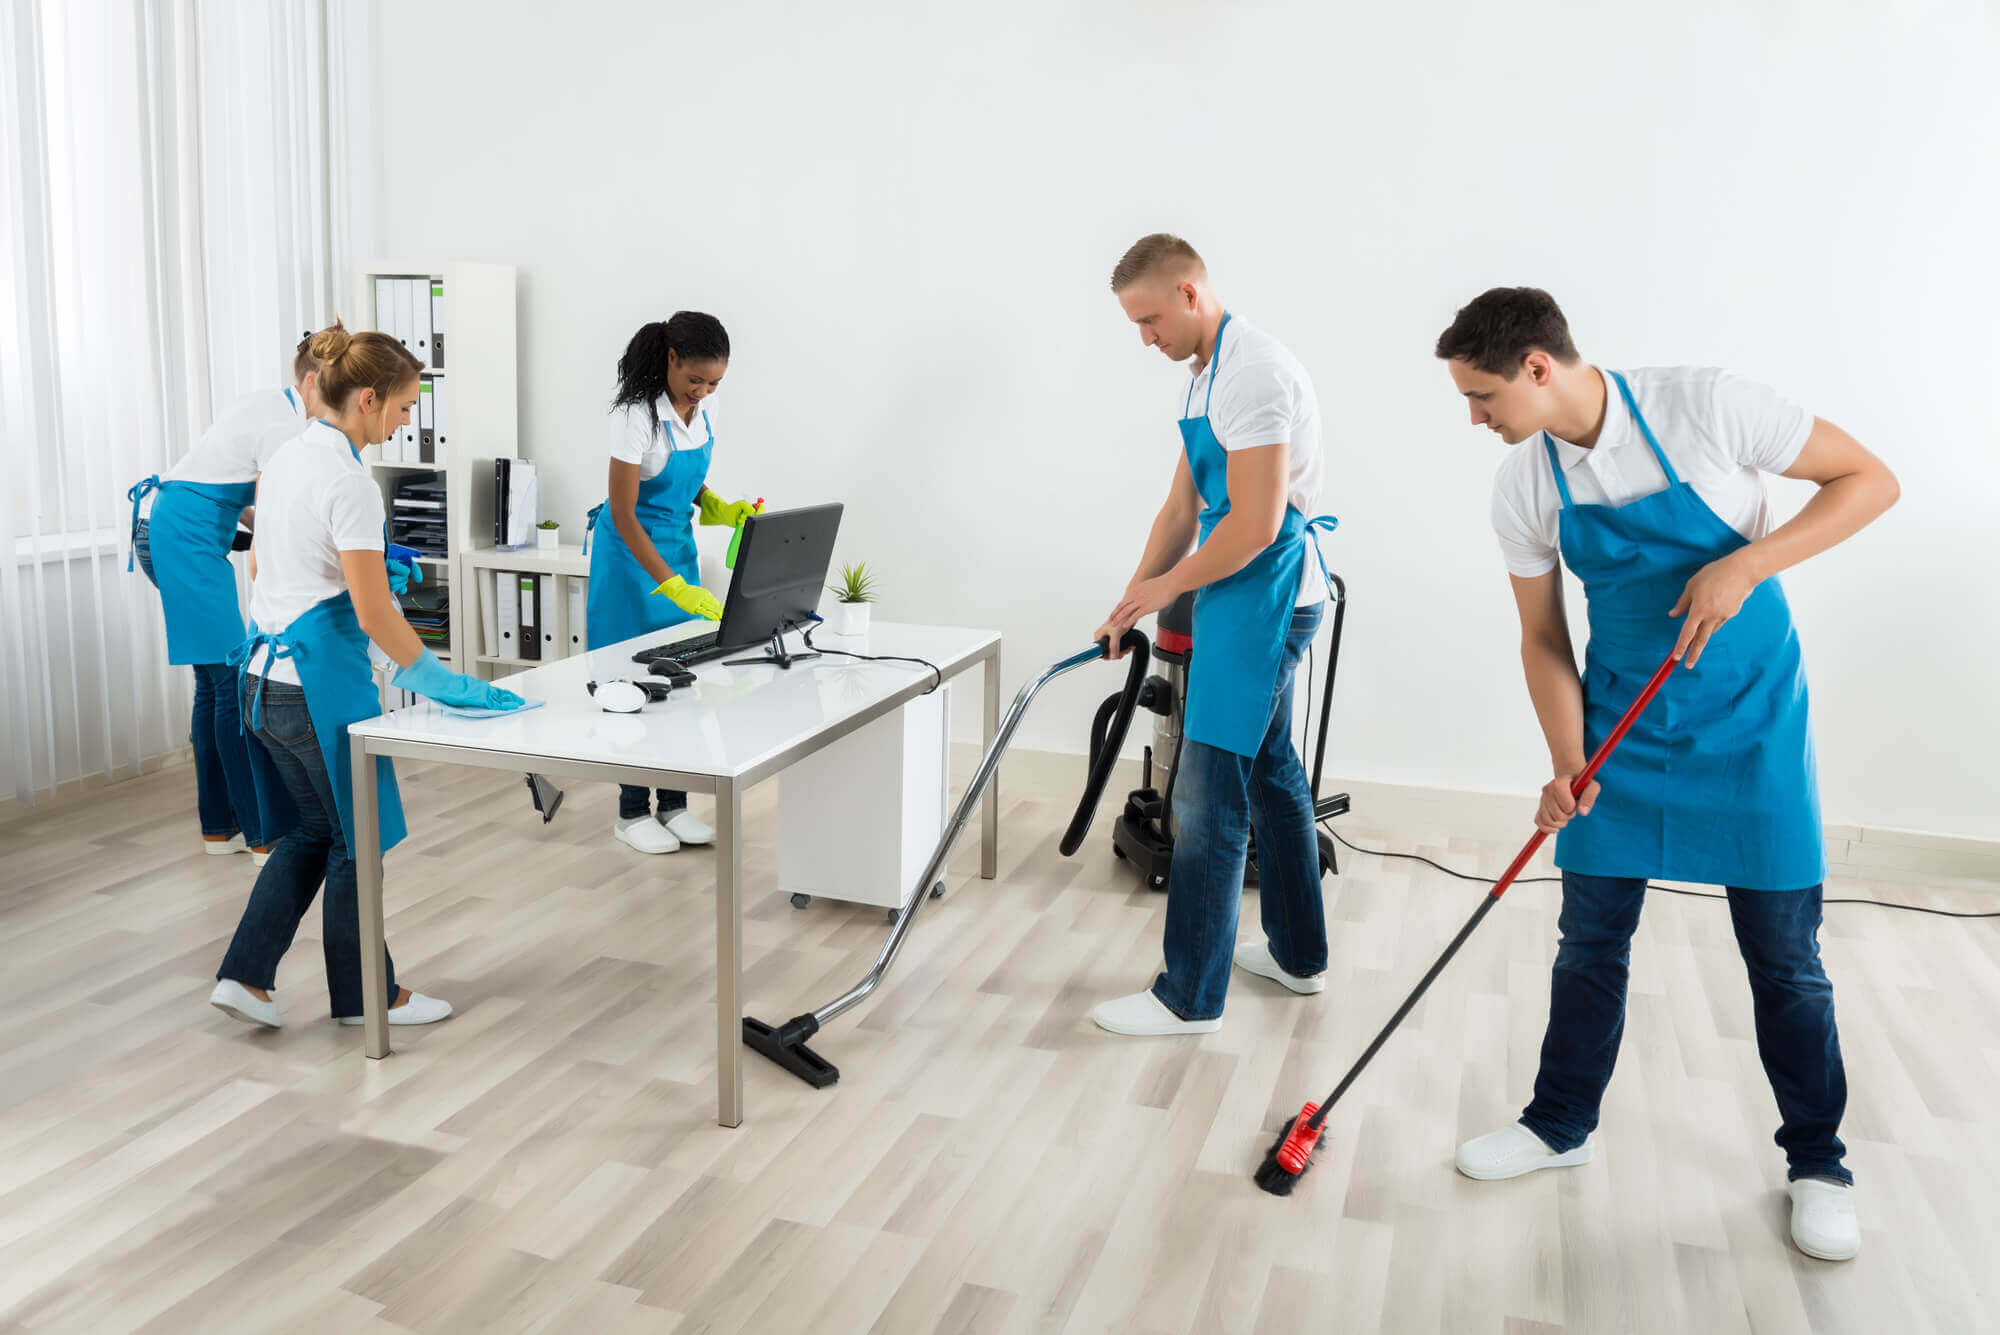 Limpeza da Casa: Como fazer uma Faxina Completa no Banheiro